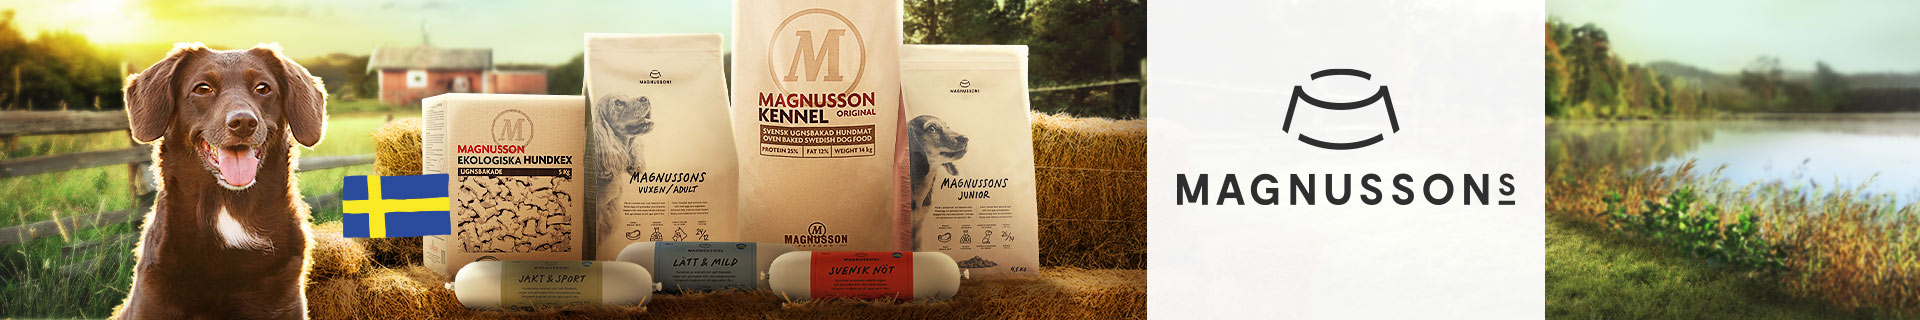 Magnusson Hund